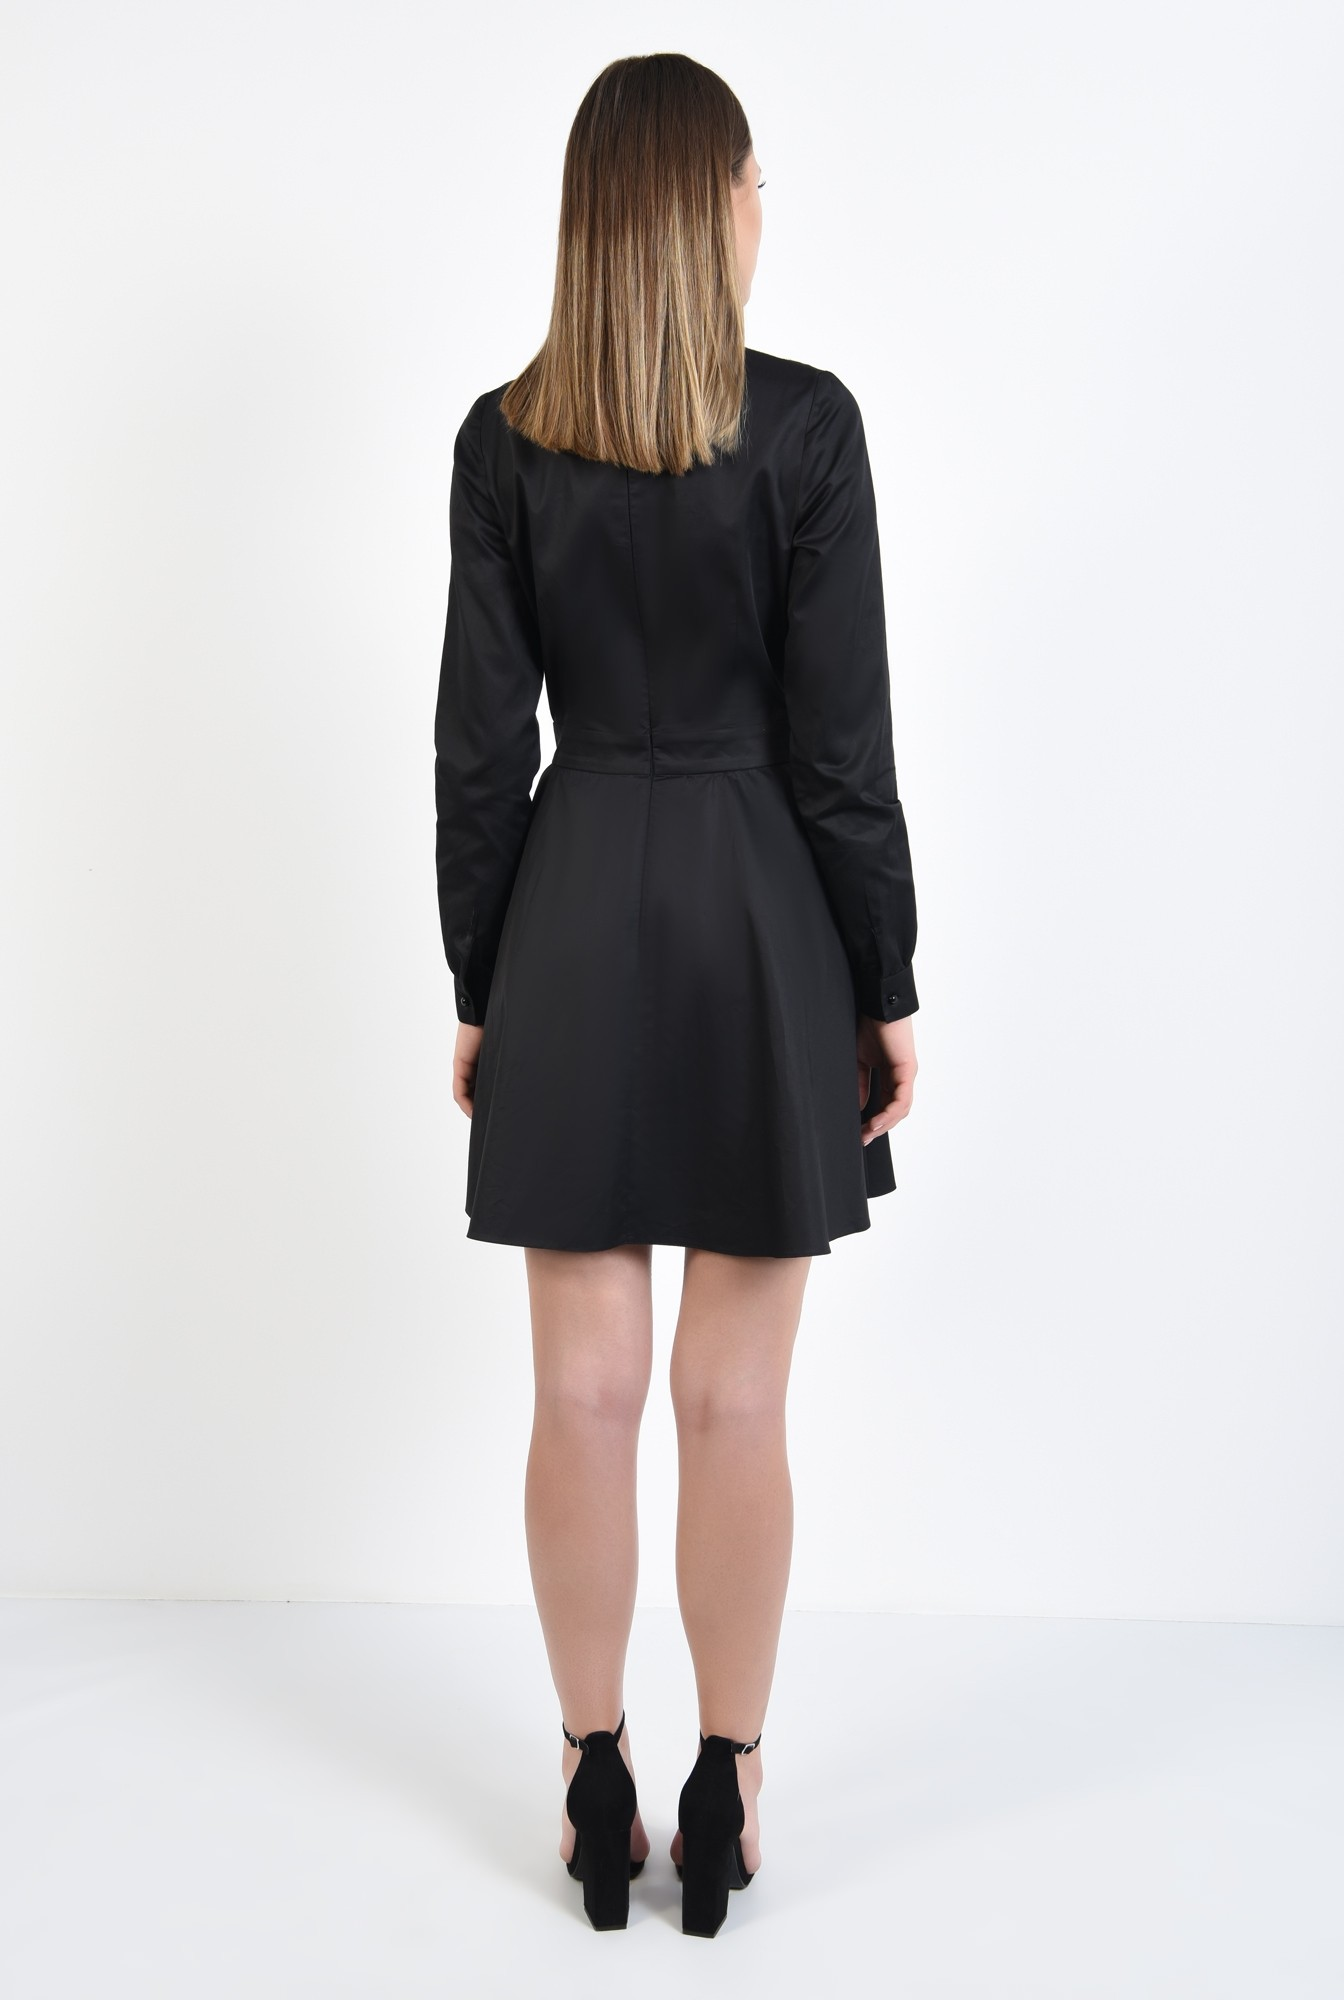 1 - rochie neagra, cu platca din dantela, cu brosa, croi evazat